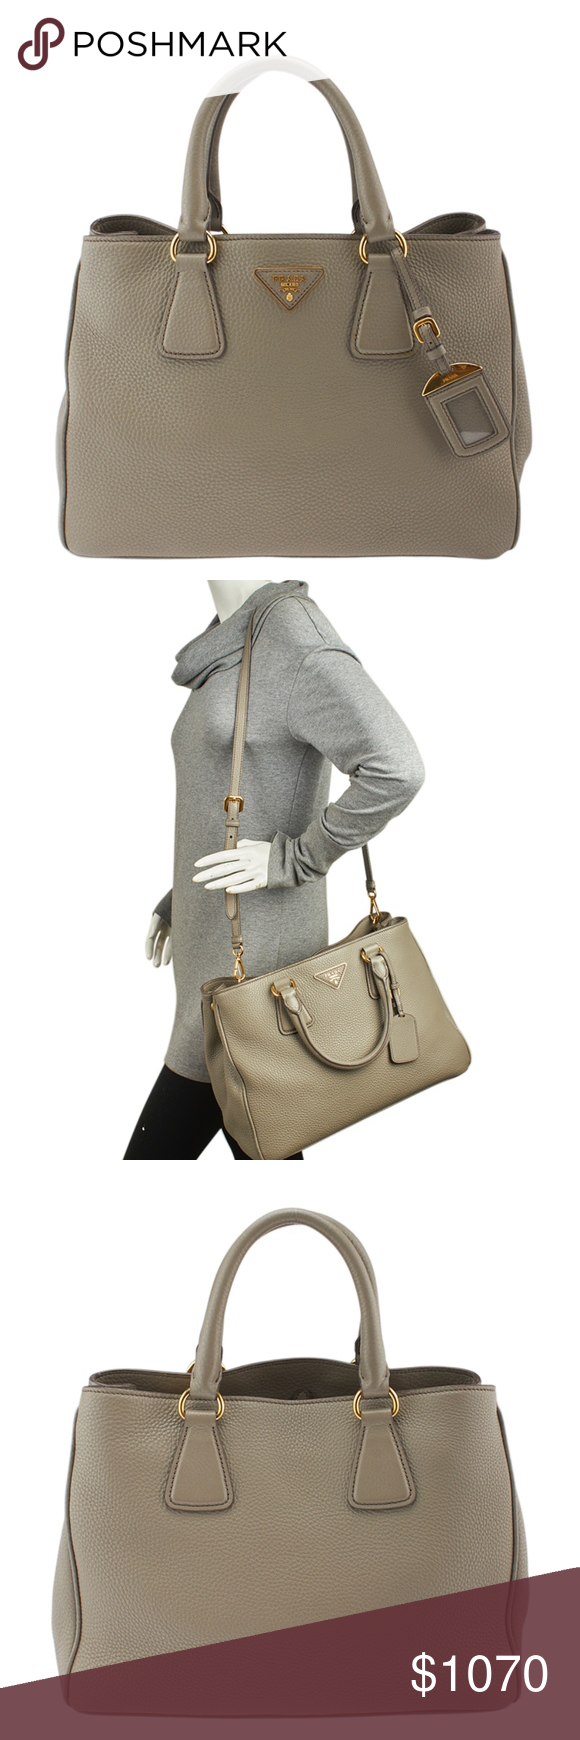 51c0346915 Prada BN2579 Grey Leather 2-Way Bag (138665)